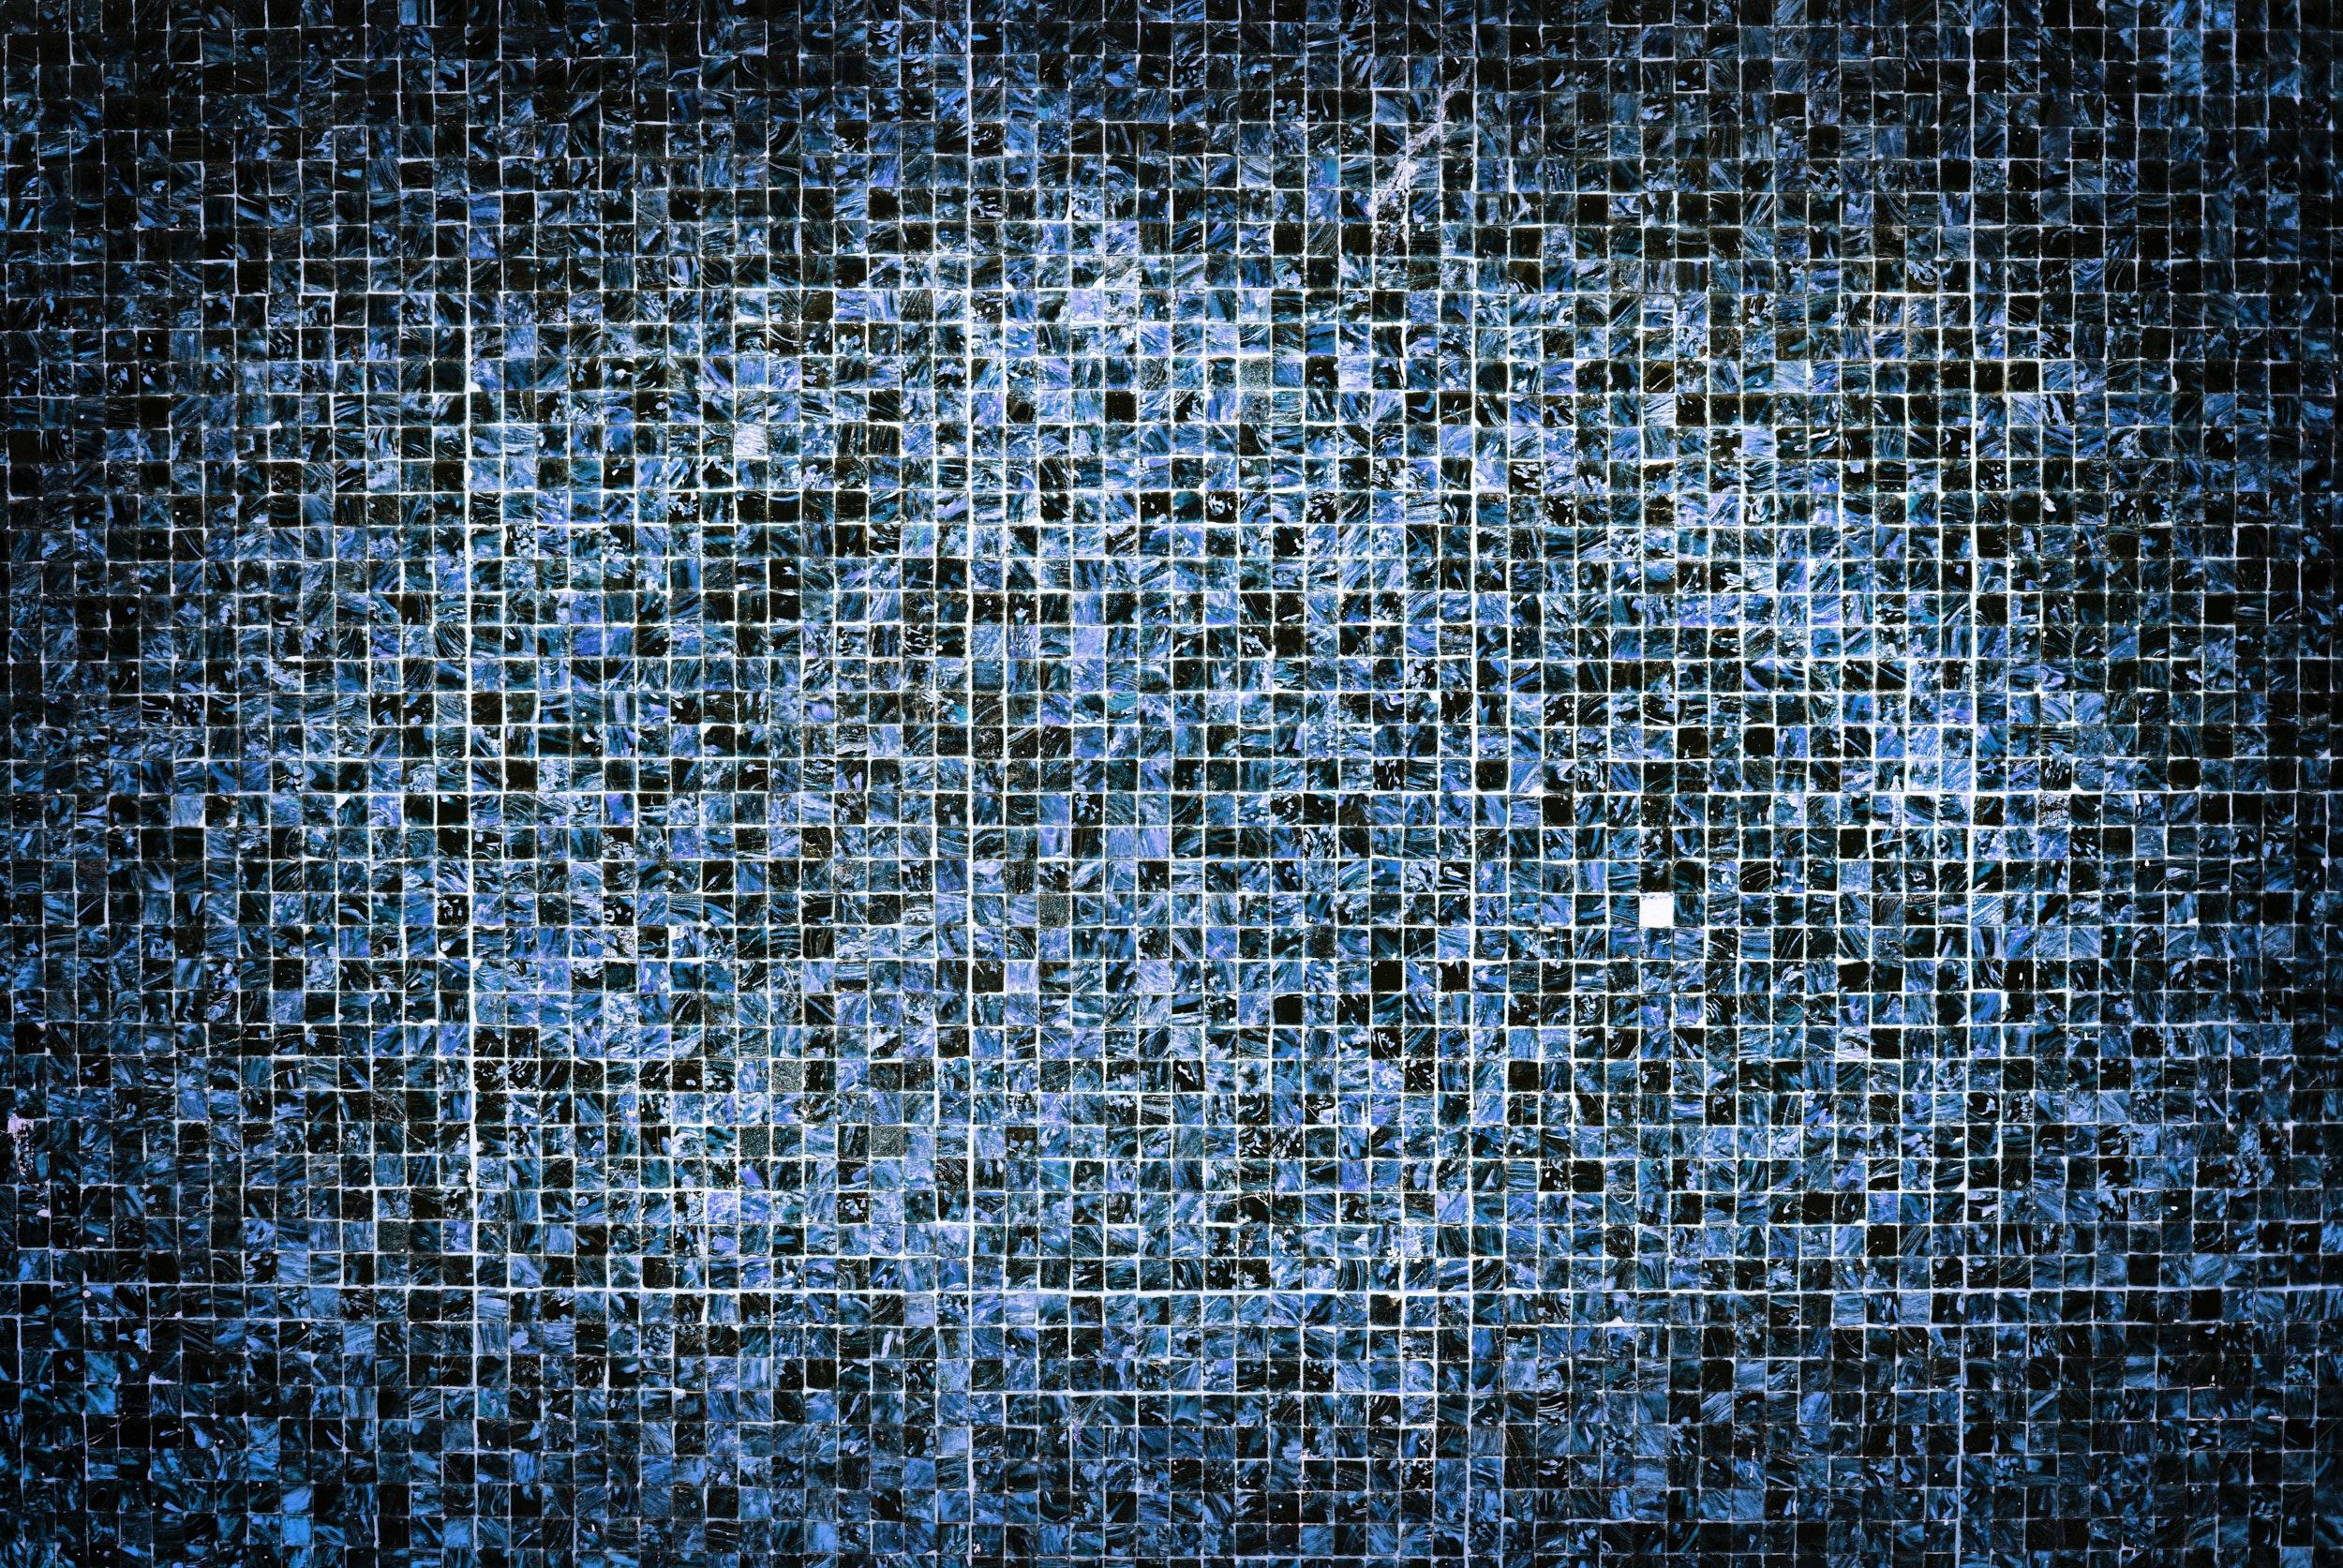 Photo Mosaic Wallpaper, Pattern, Wall, Tiles, Texture, HQ Photo